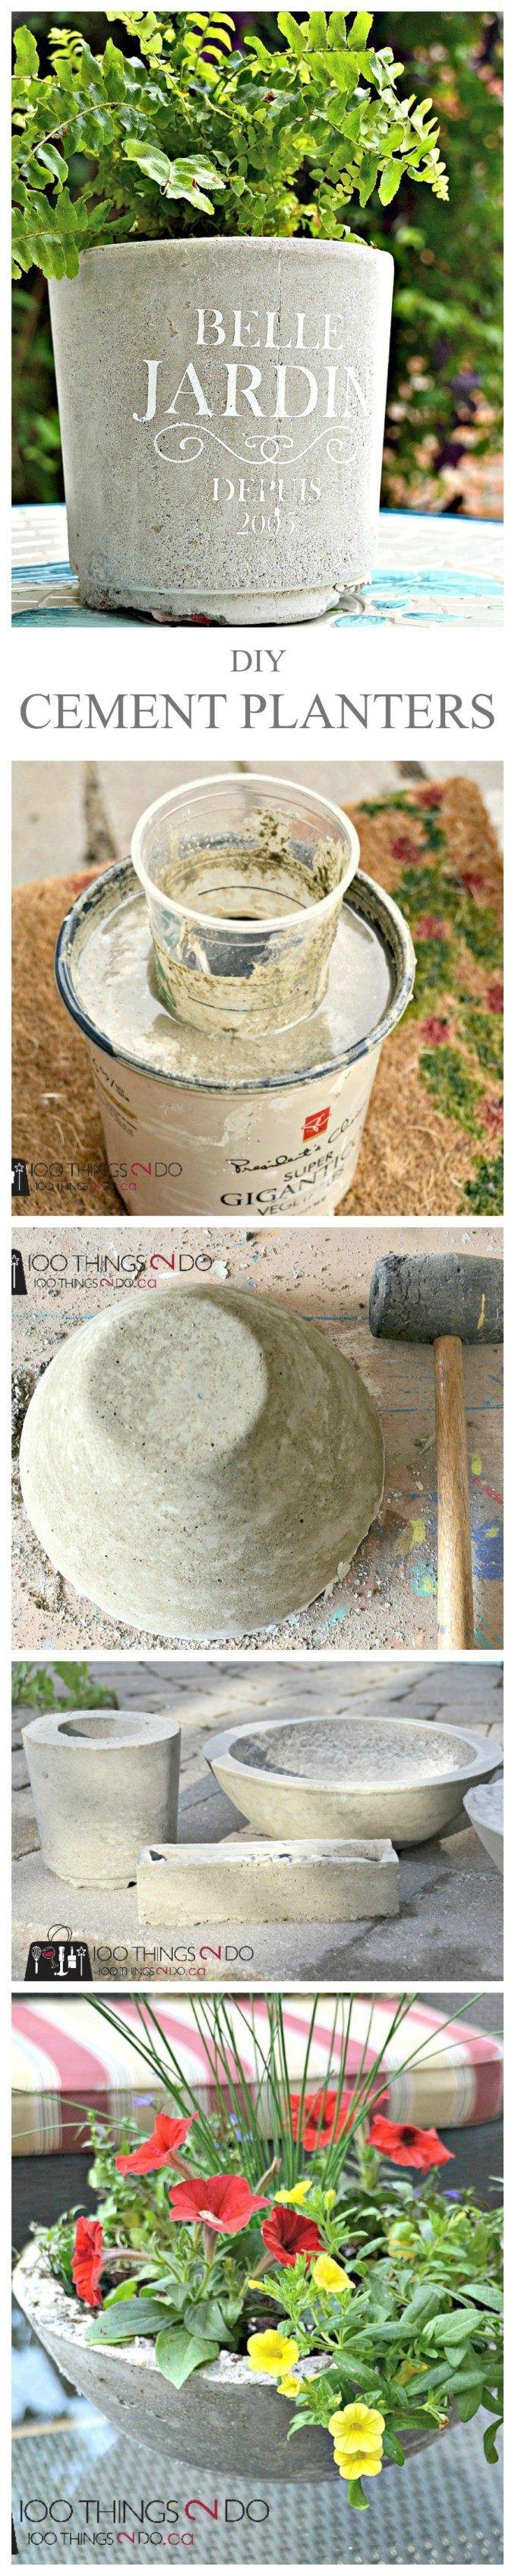 M s de 25 ideas fant sticas sobre jardineras de cemento en for Jardineras de cemento